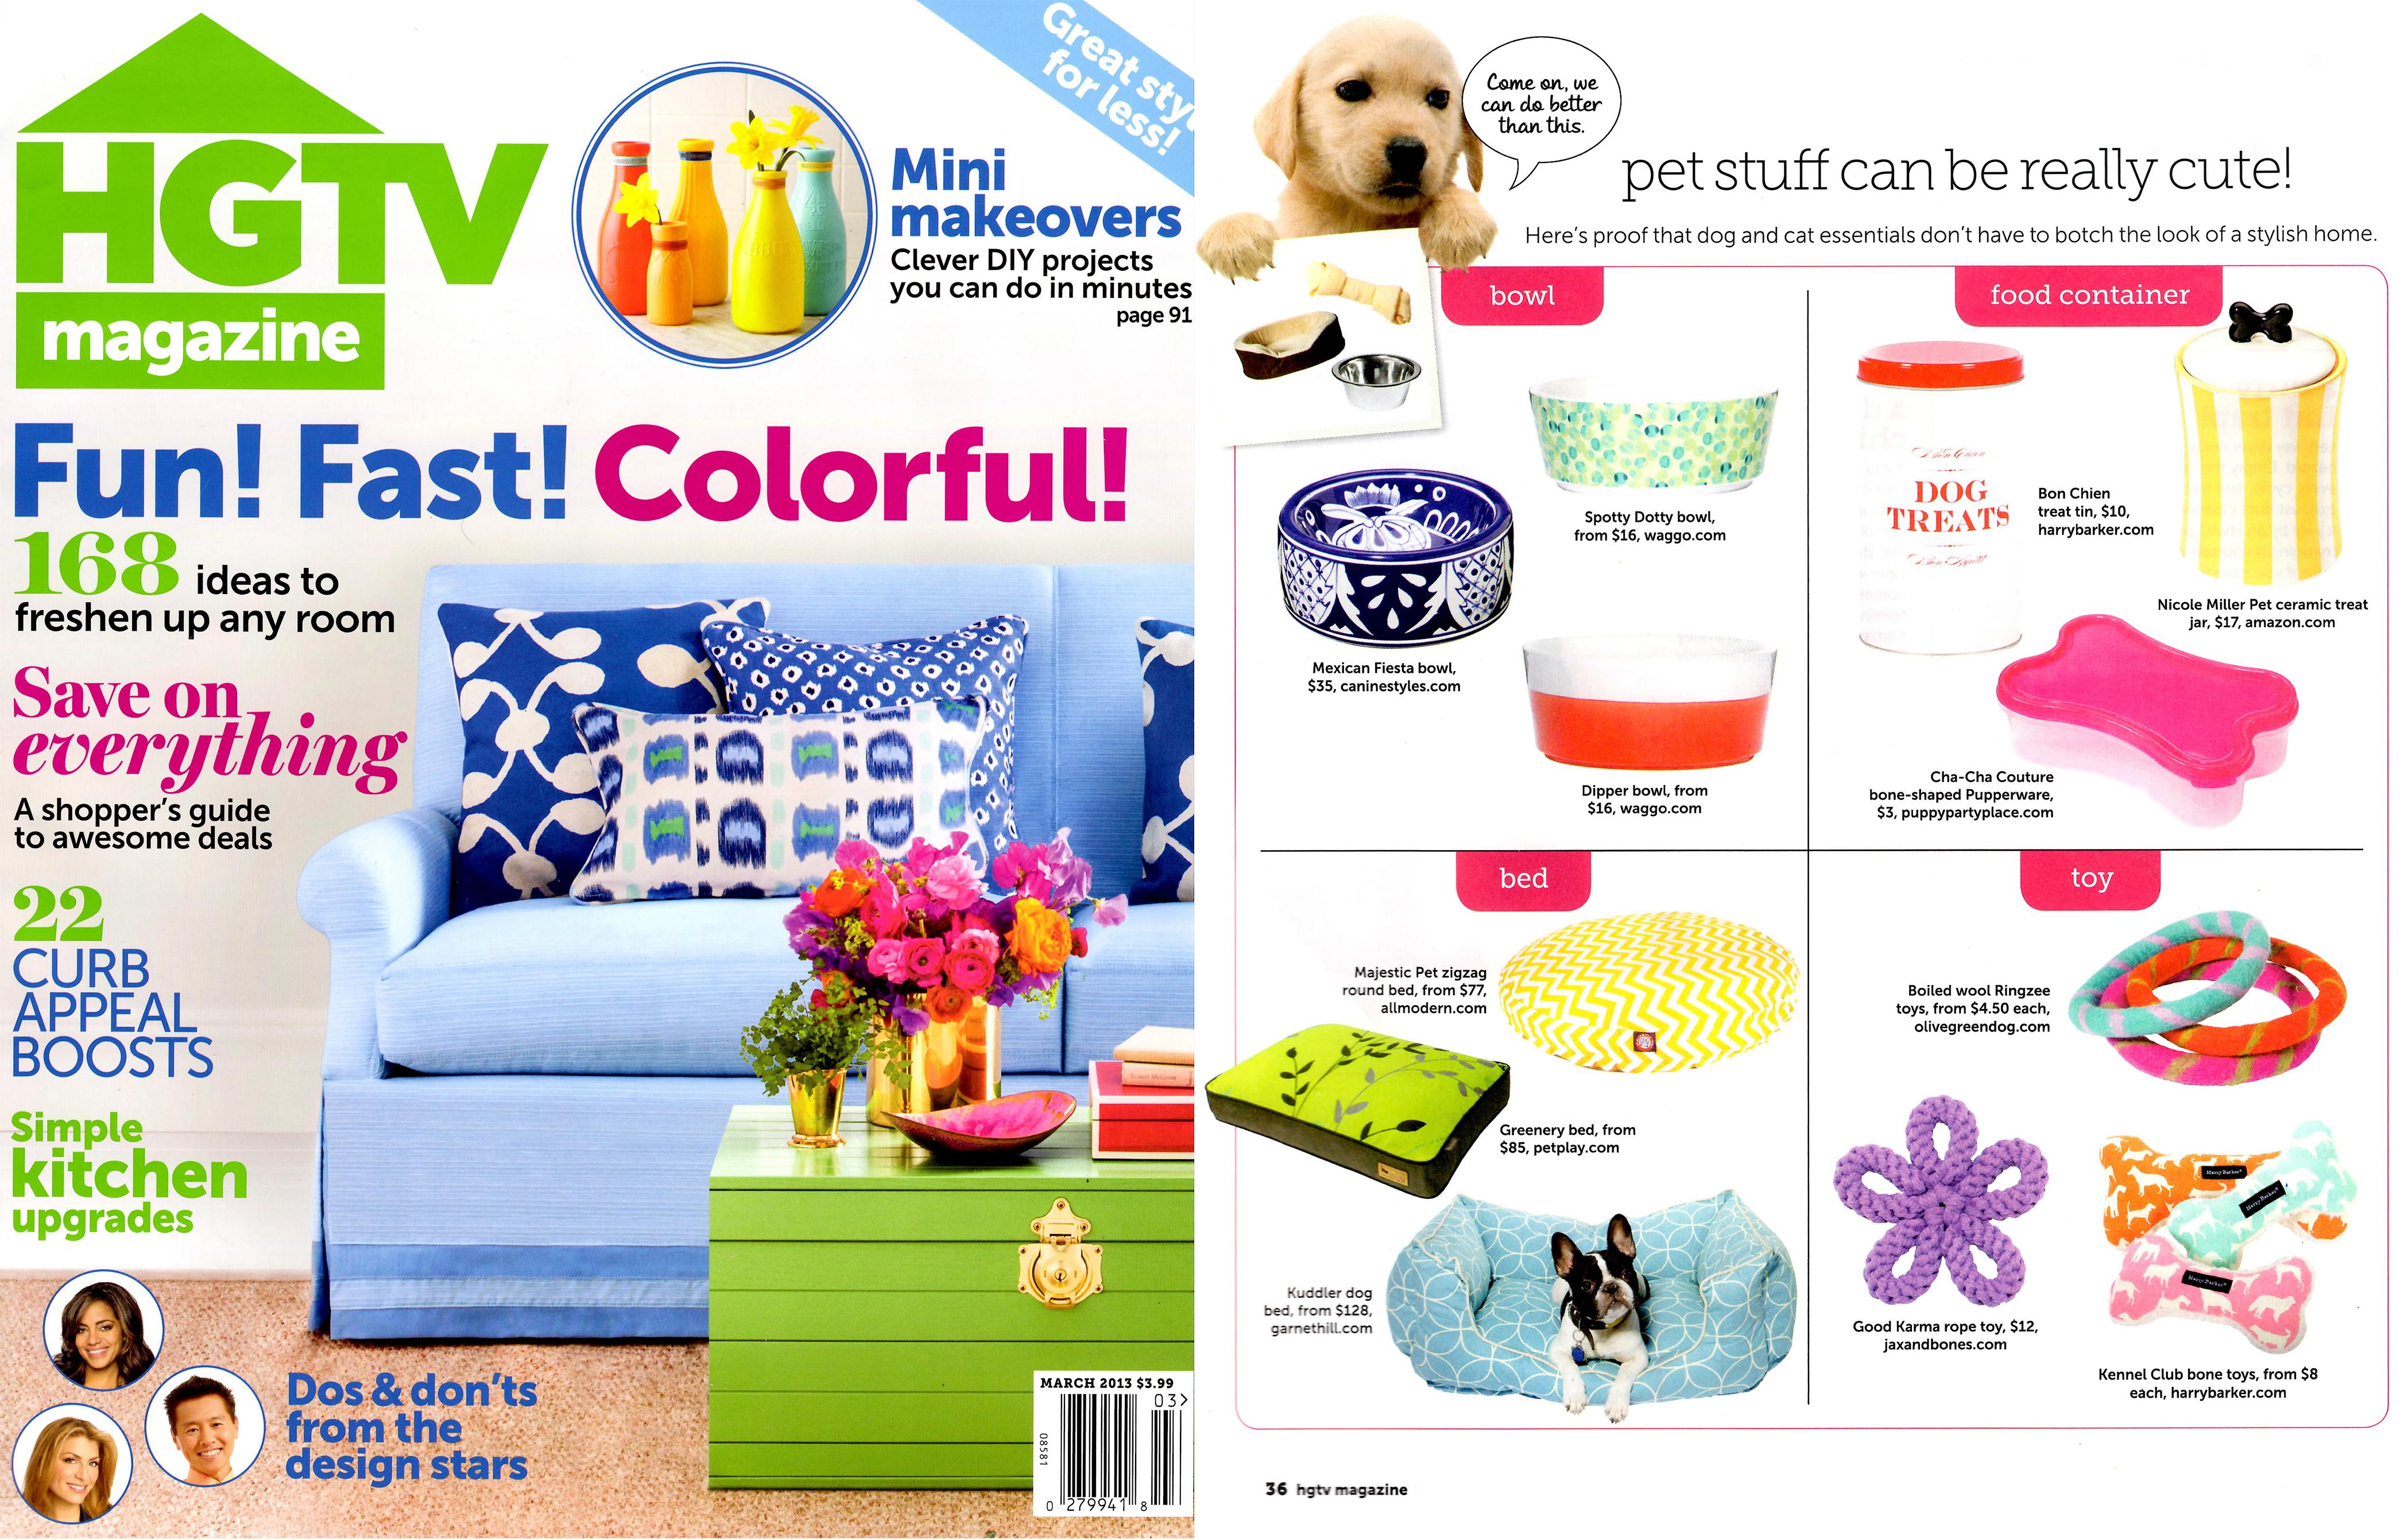 HGTV Magazine March 2013 Waggo Dishwasher Safe Dog Bowls